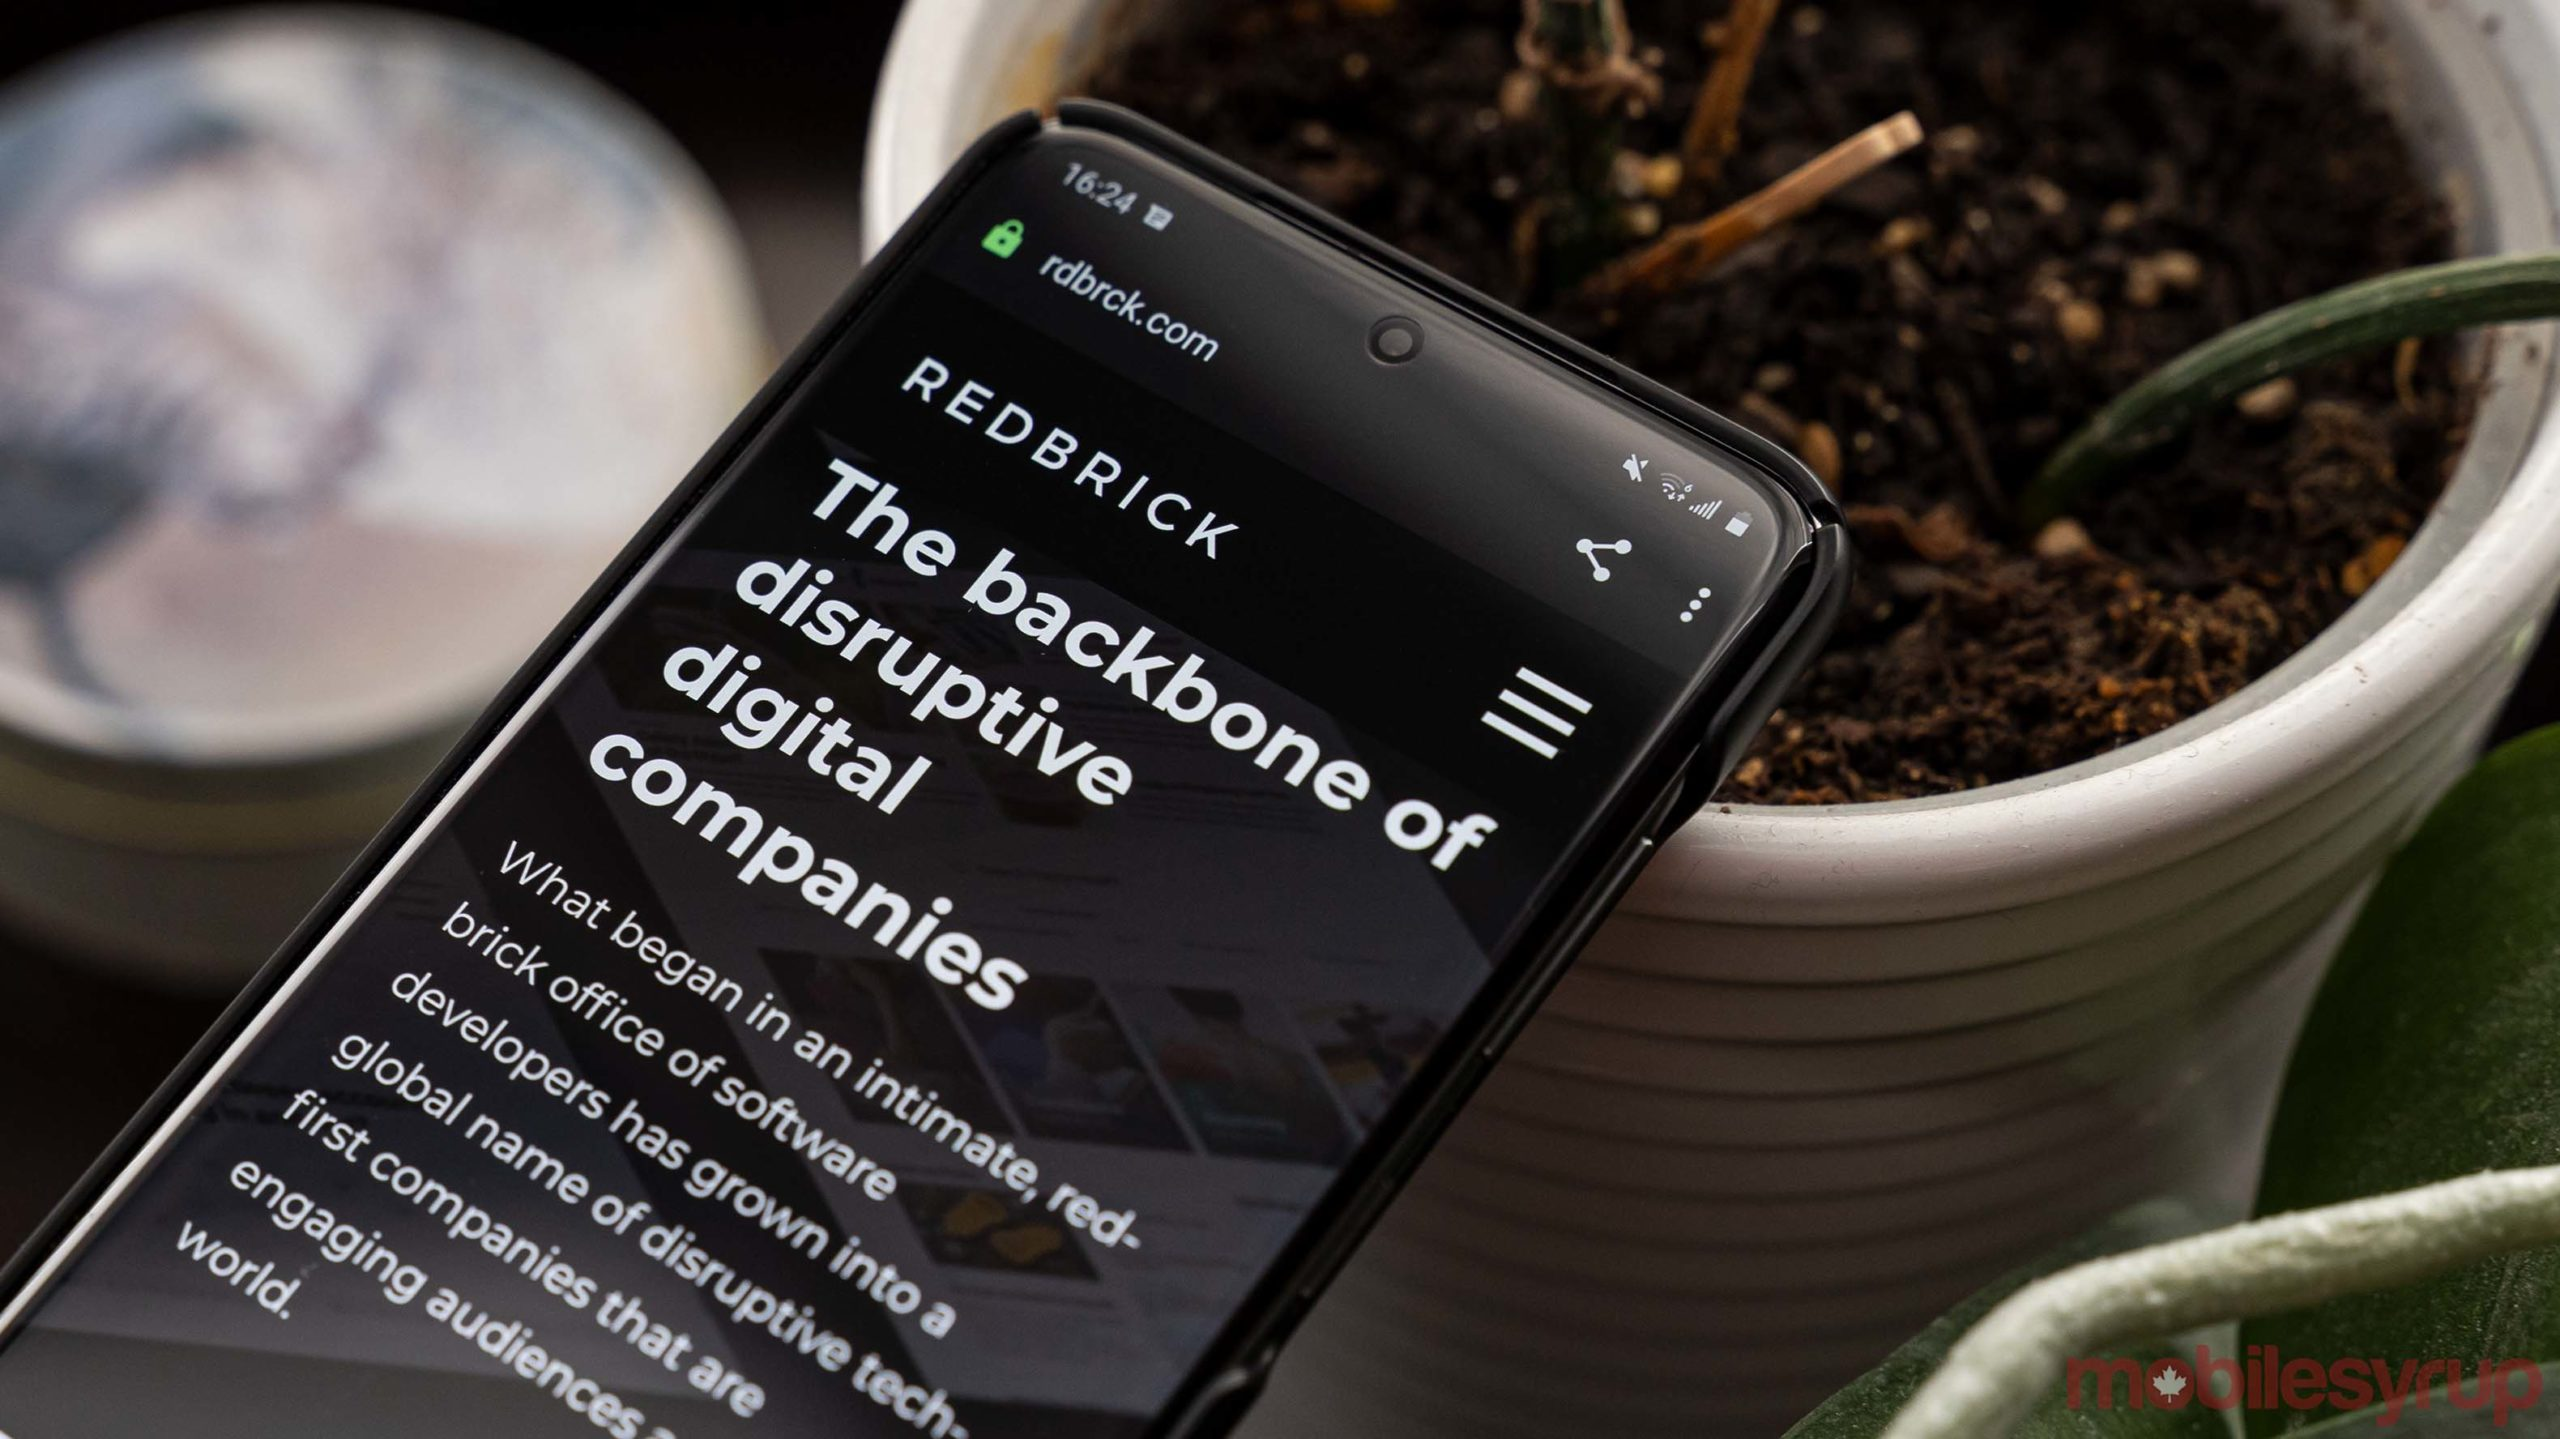 Redbrick website on a phone